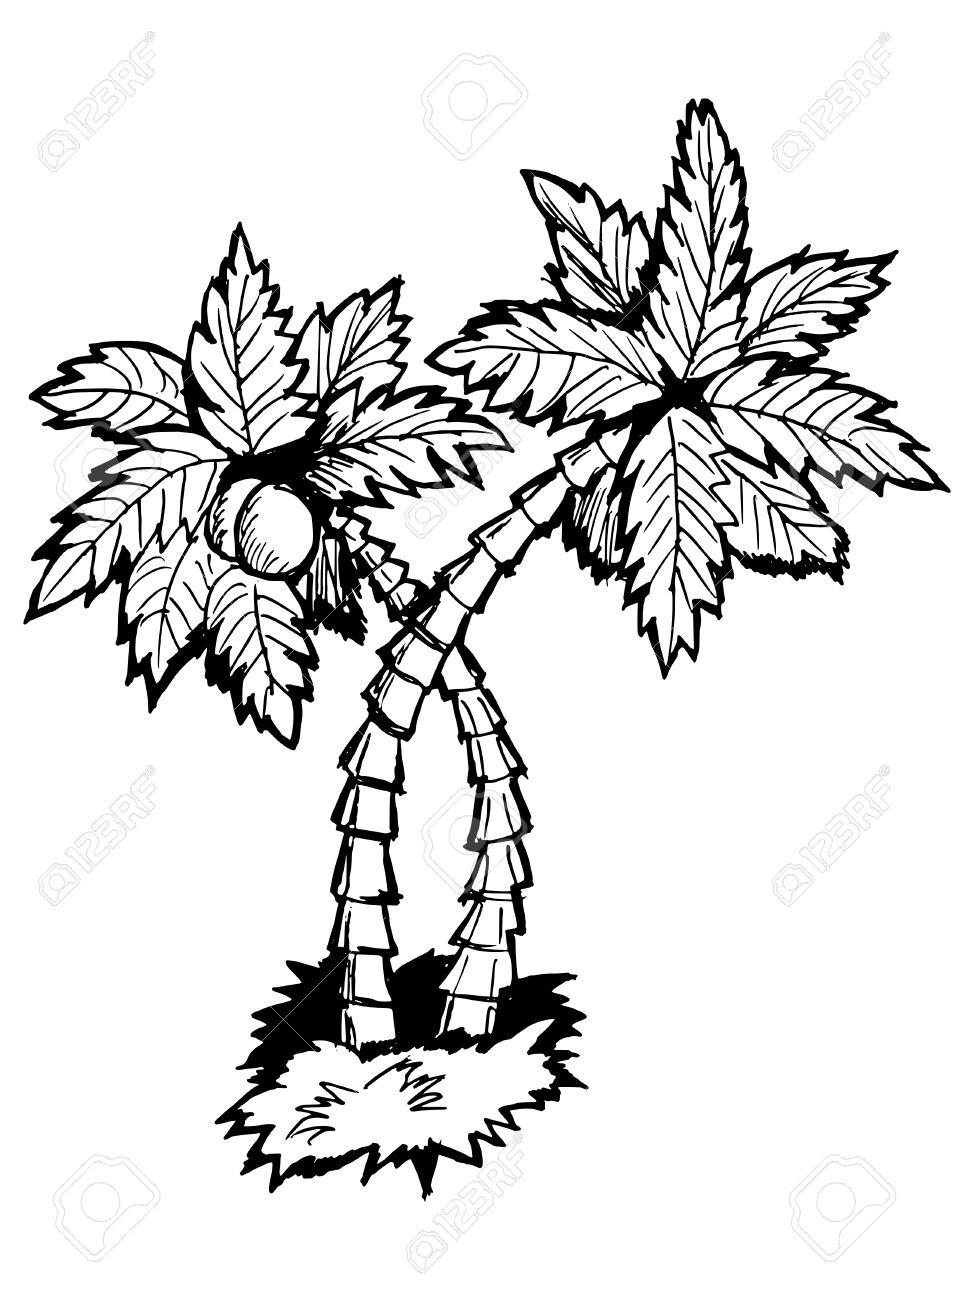 974x1300 Palm Tree Cartoon Drawing Hand Drawn, Vector, Cartoon Illustration